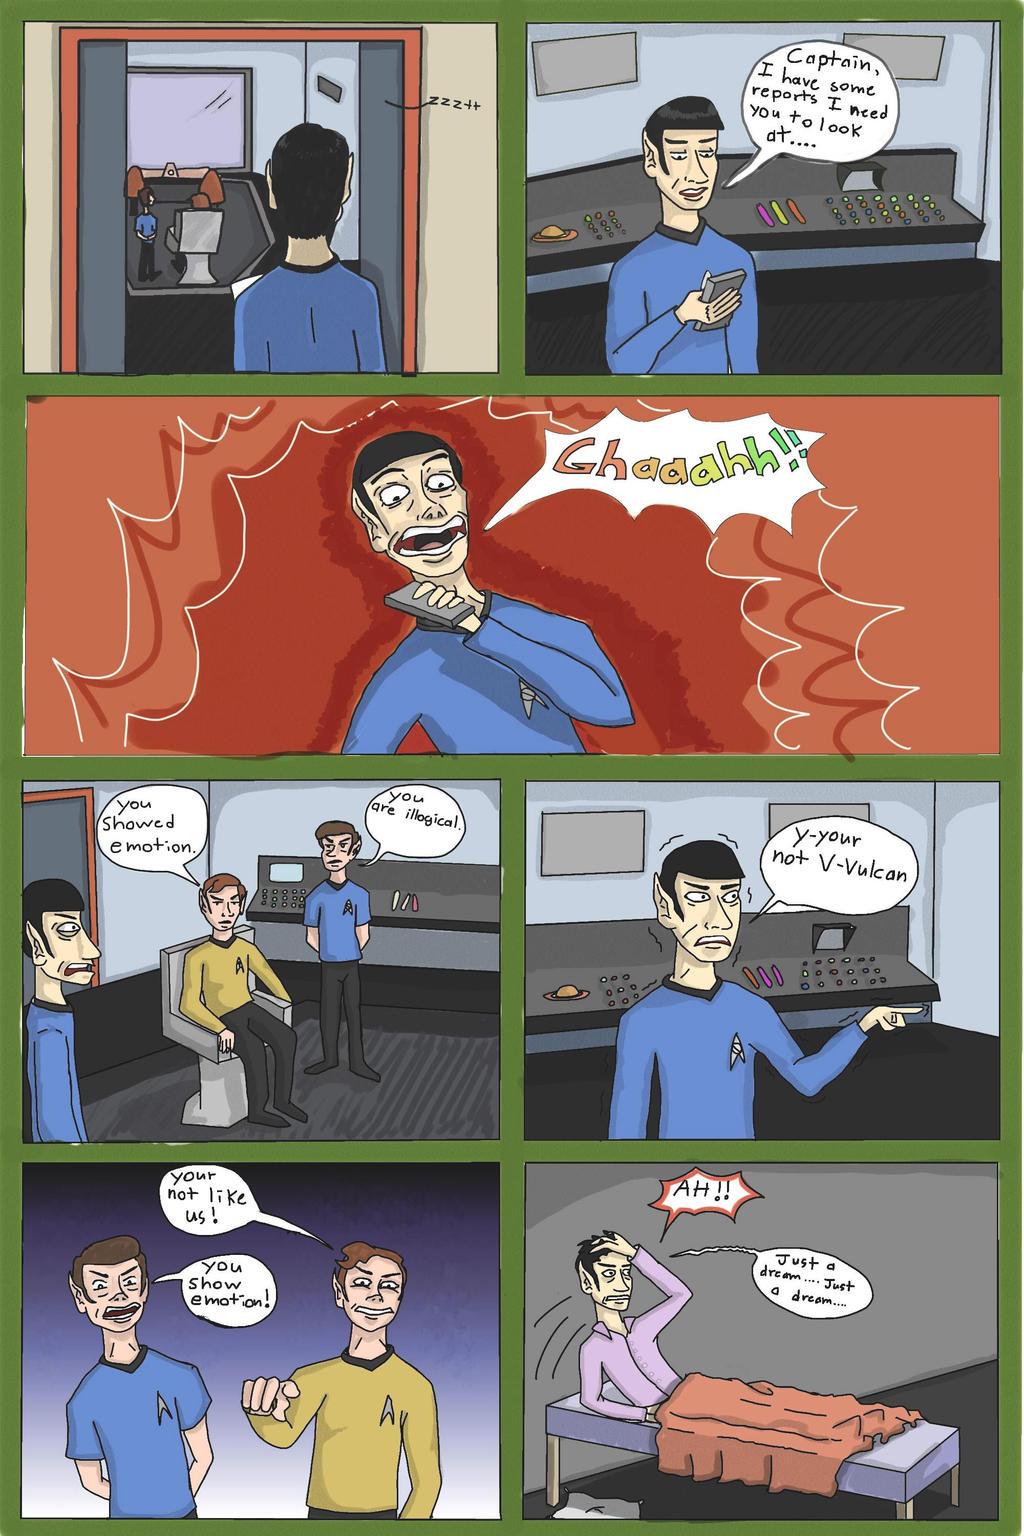 Spock's Nightmare